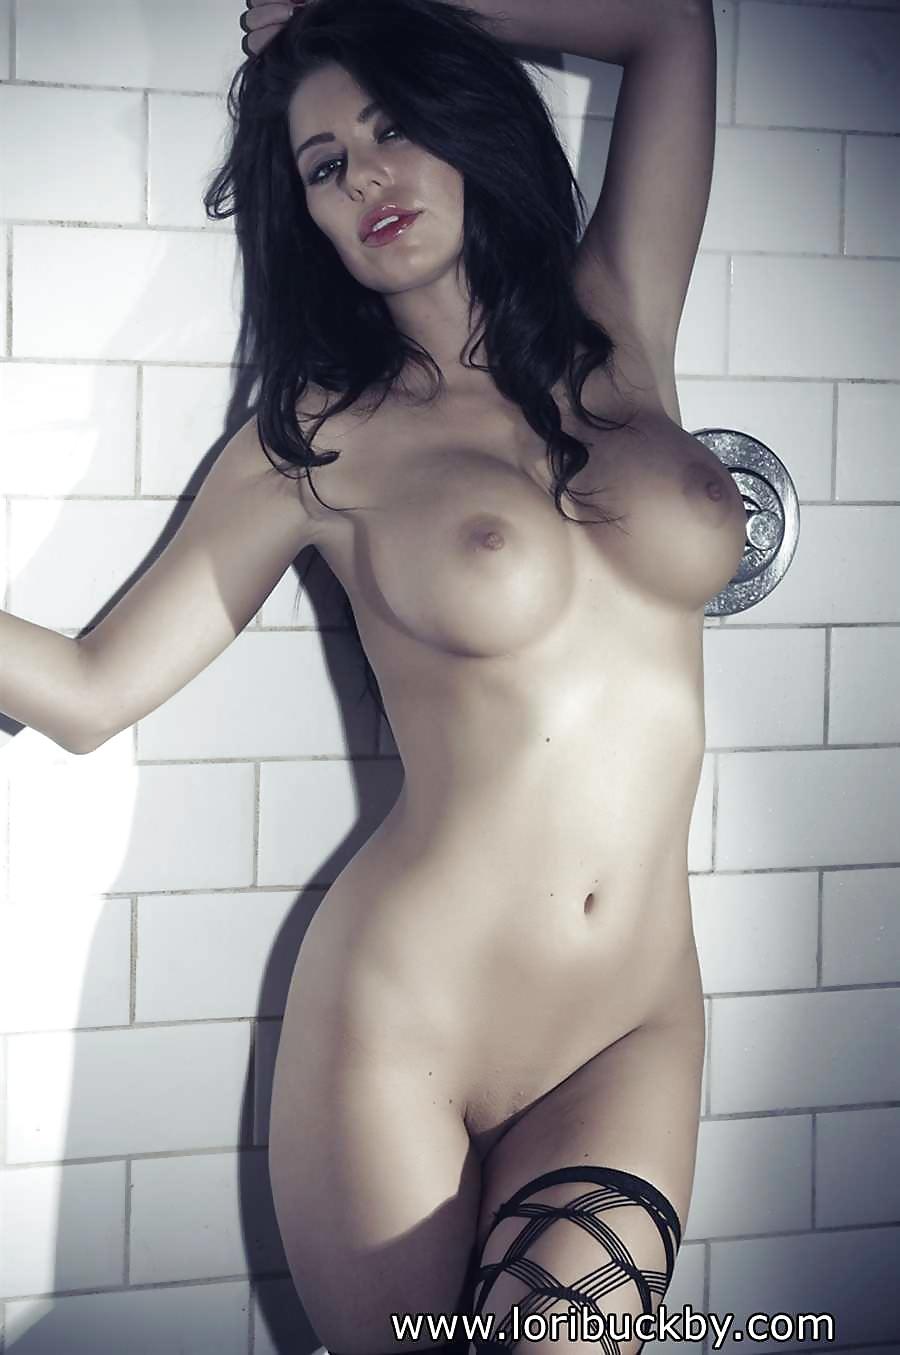 Large anal dildo videos